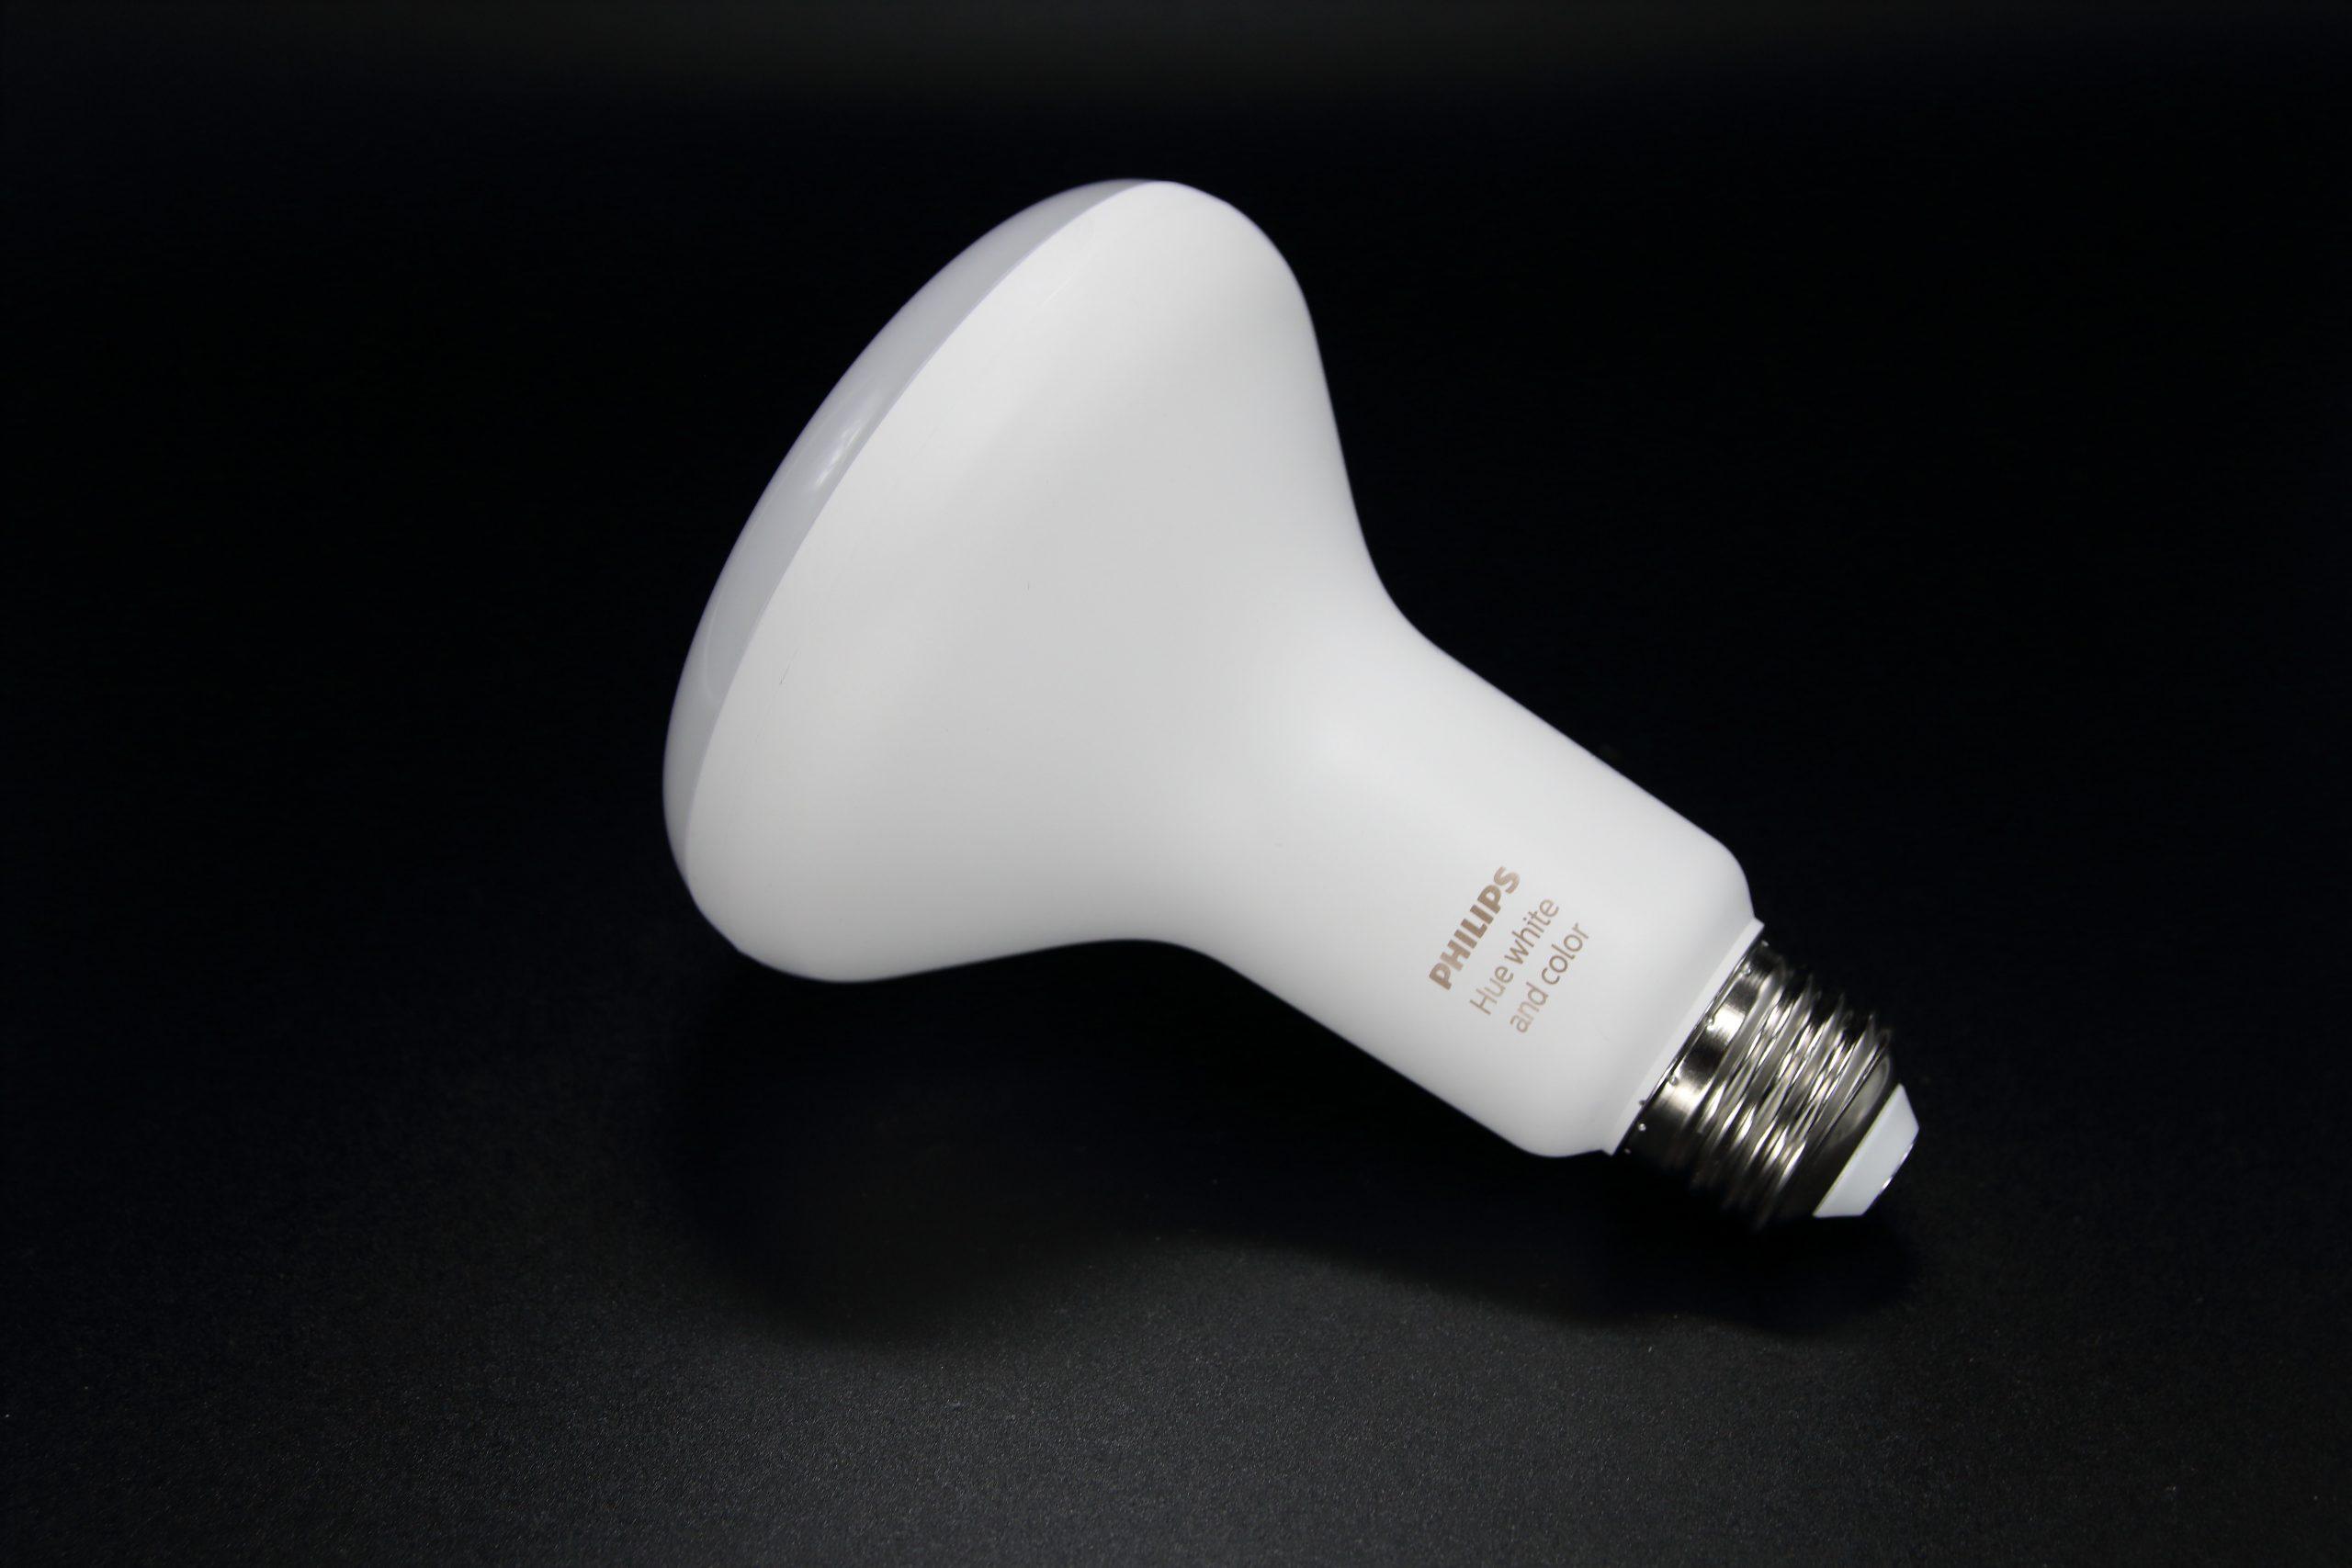 Lot of 12 Pieces Pre-Printed CFL Light Bulb Shaped Sensor Night Lights